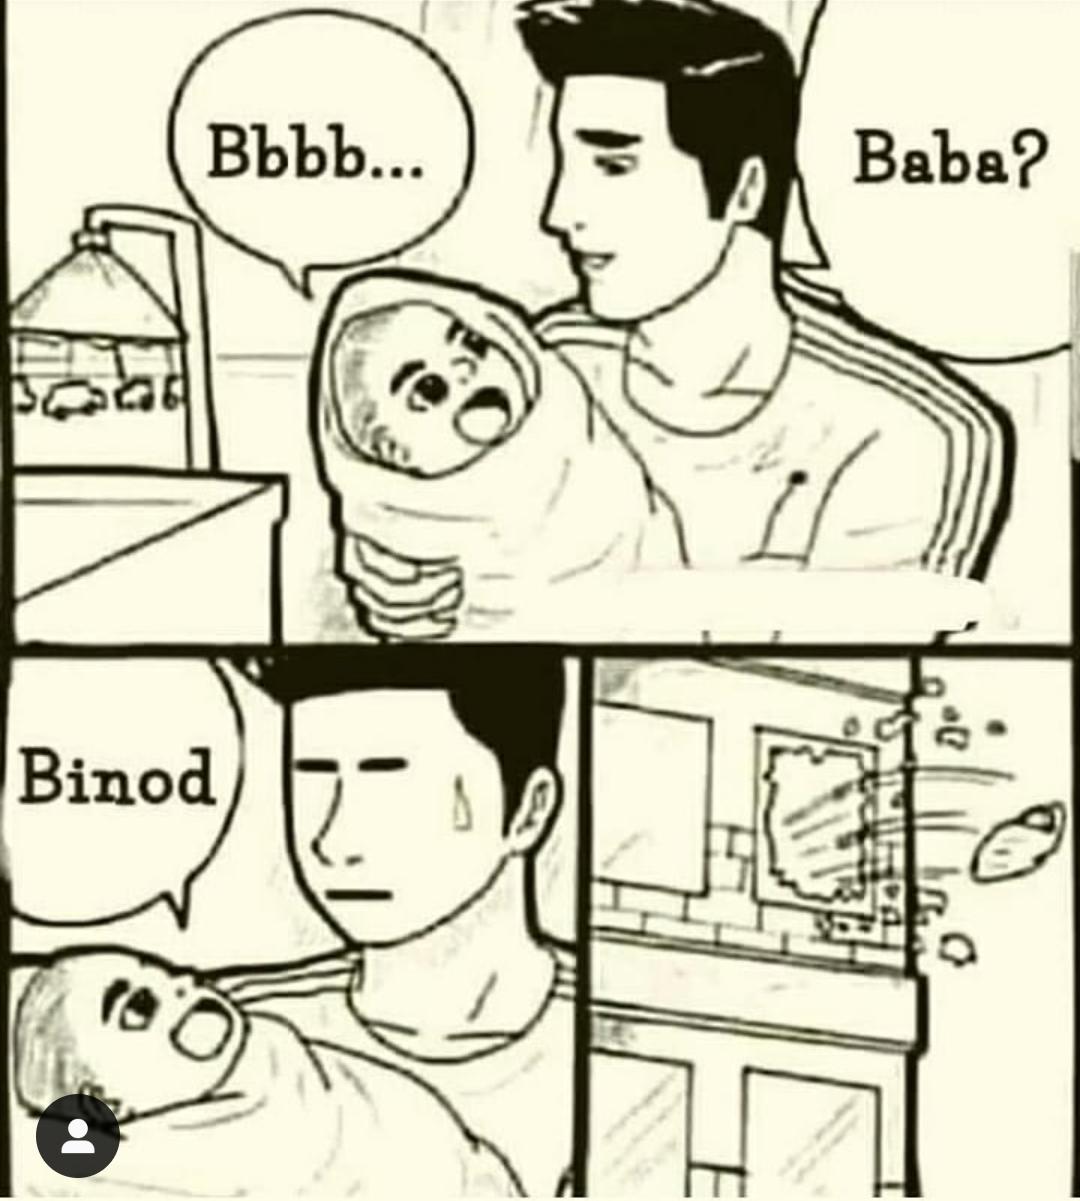 बिनोद पर बने मीम | memes on trending Binod